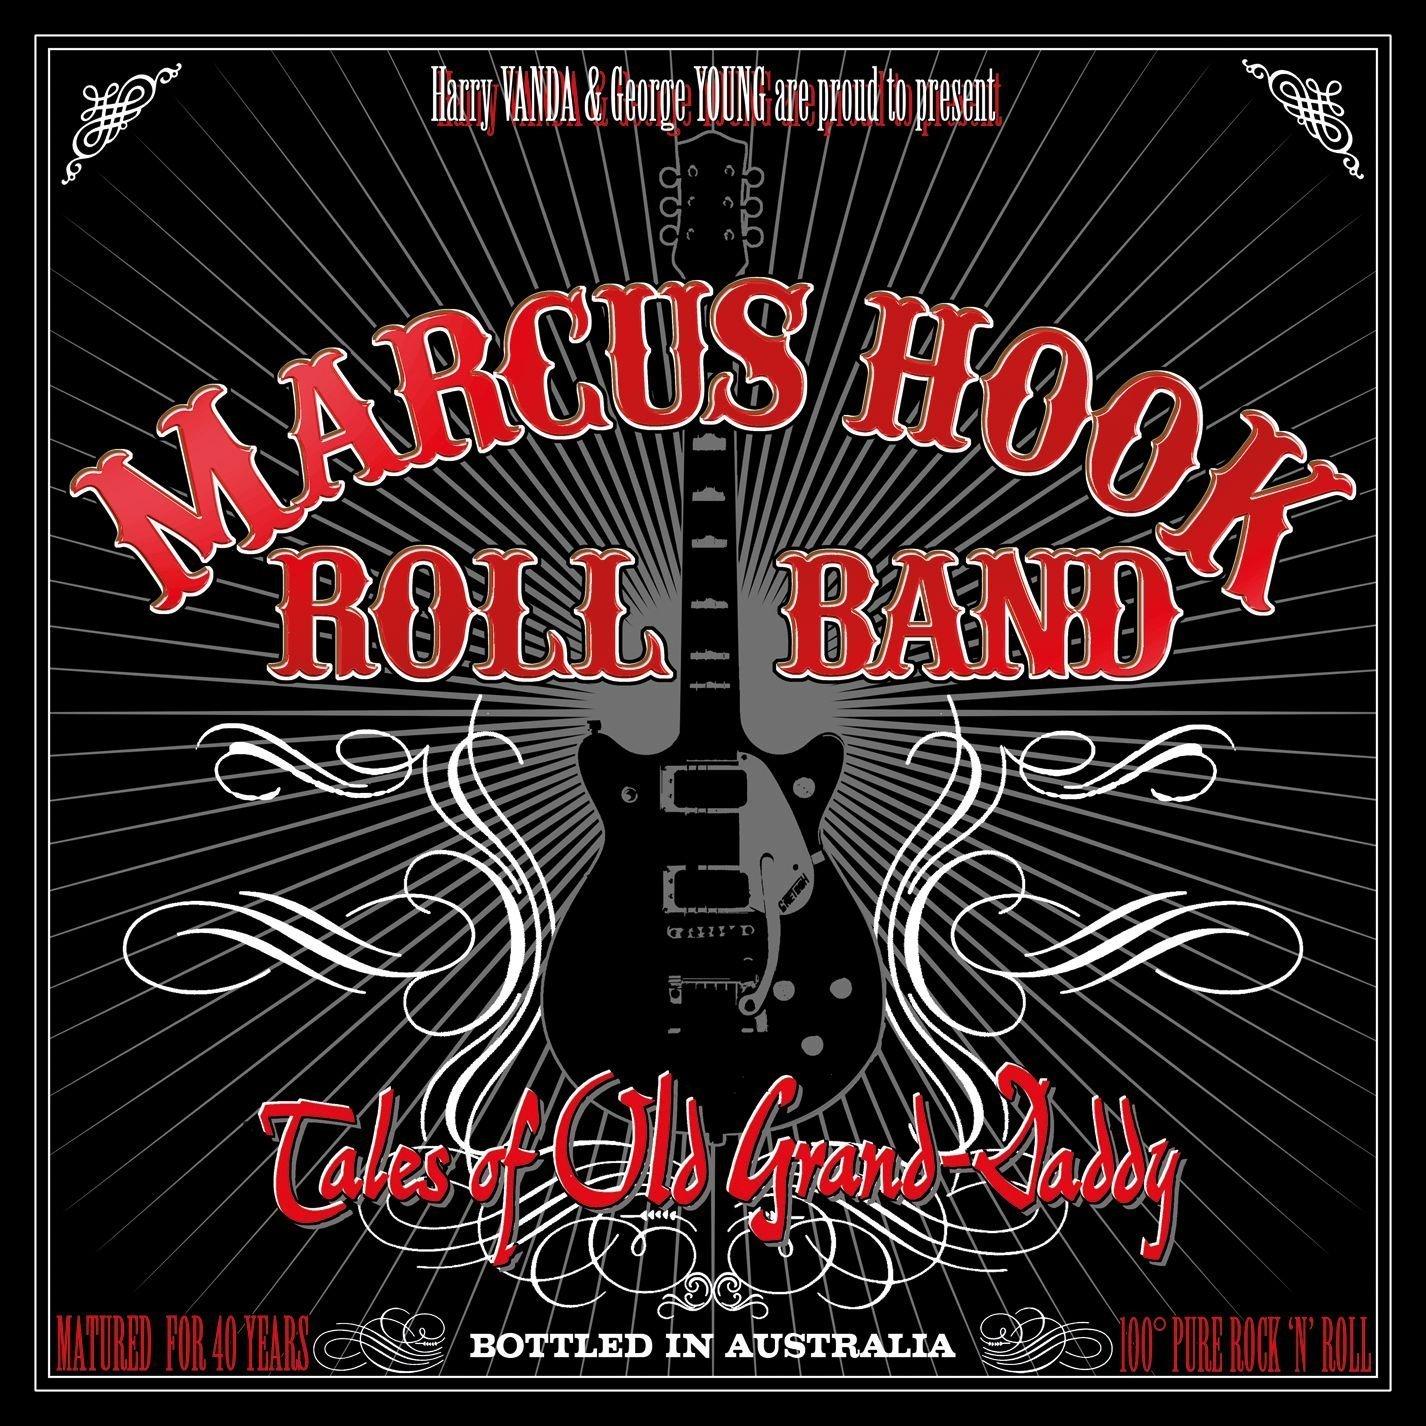 Marcus Hook Roll BandВиниловые пластинки<br>Виниловая пластинка<br>